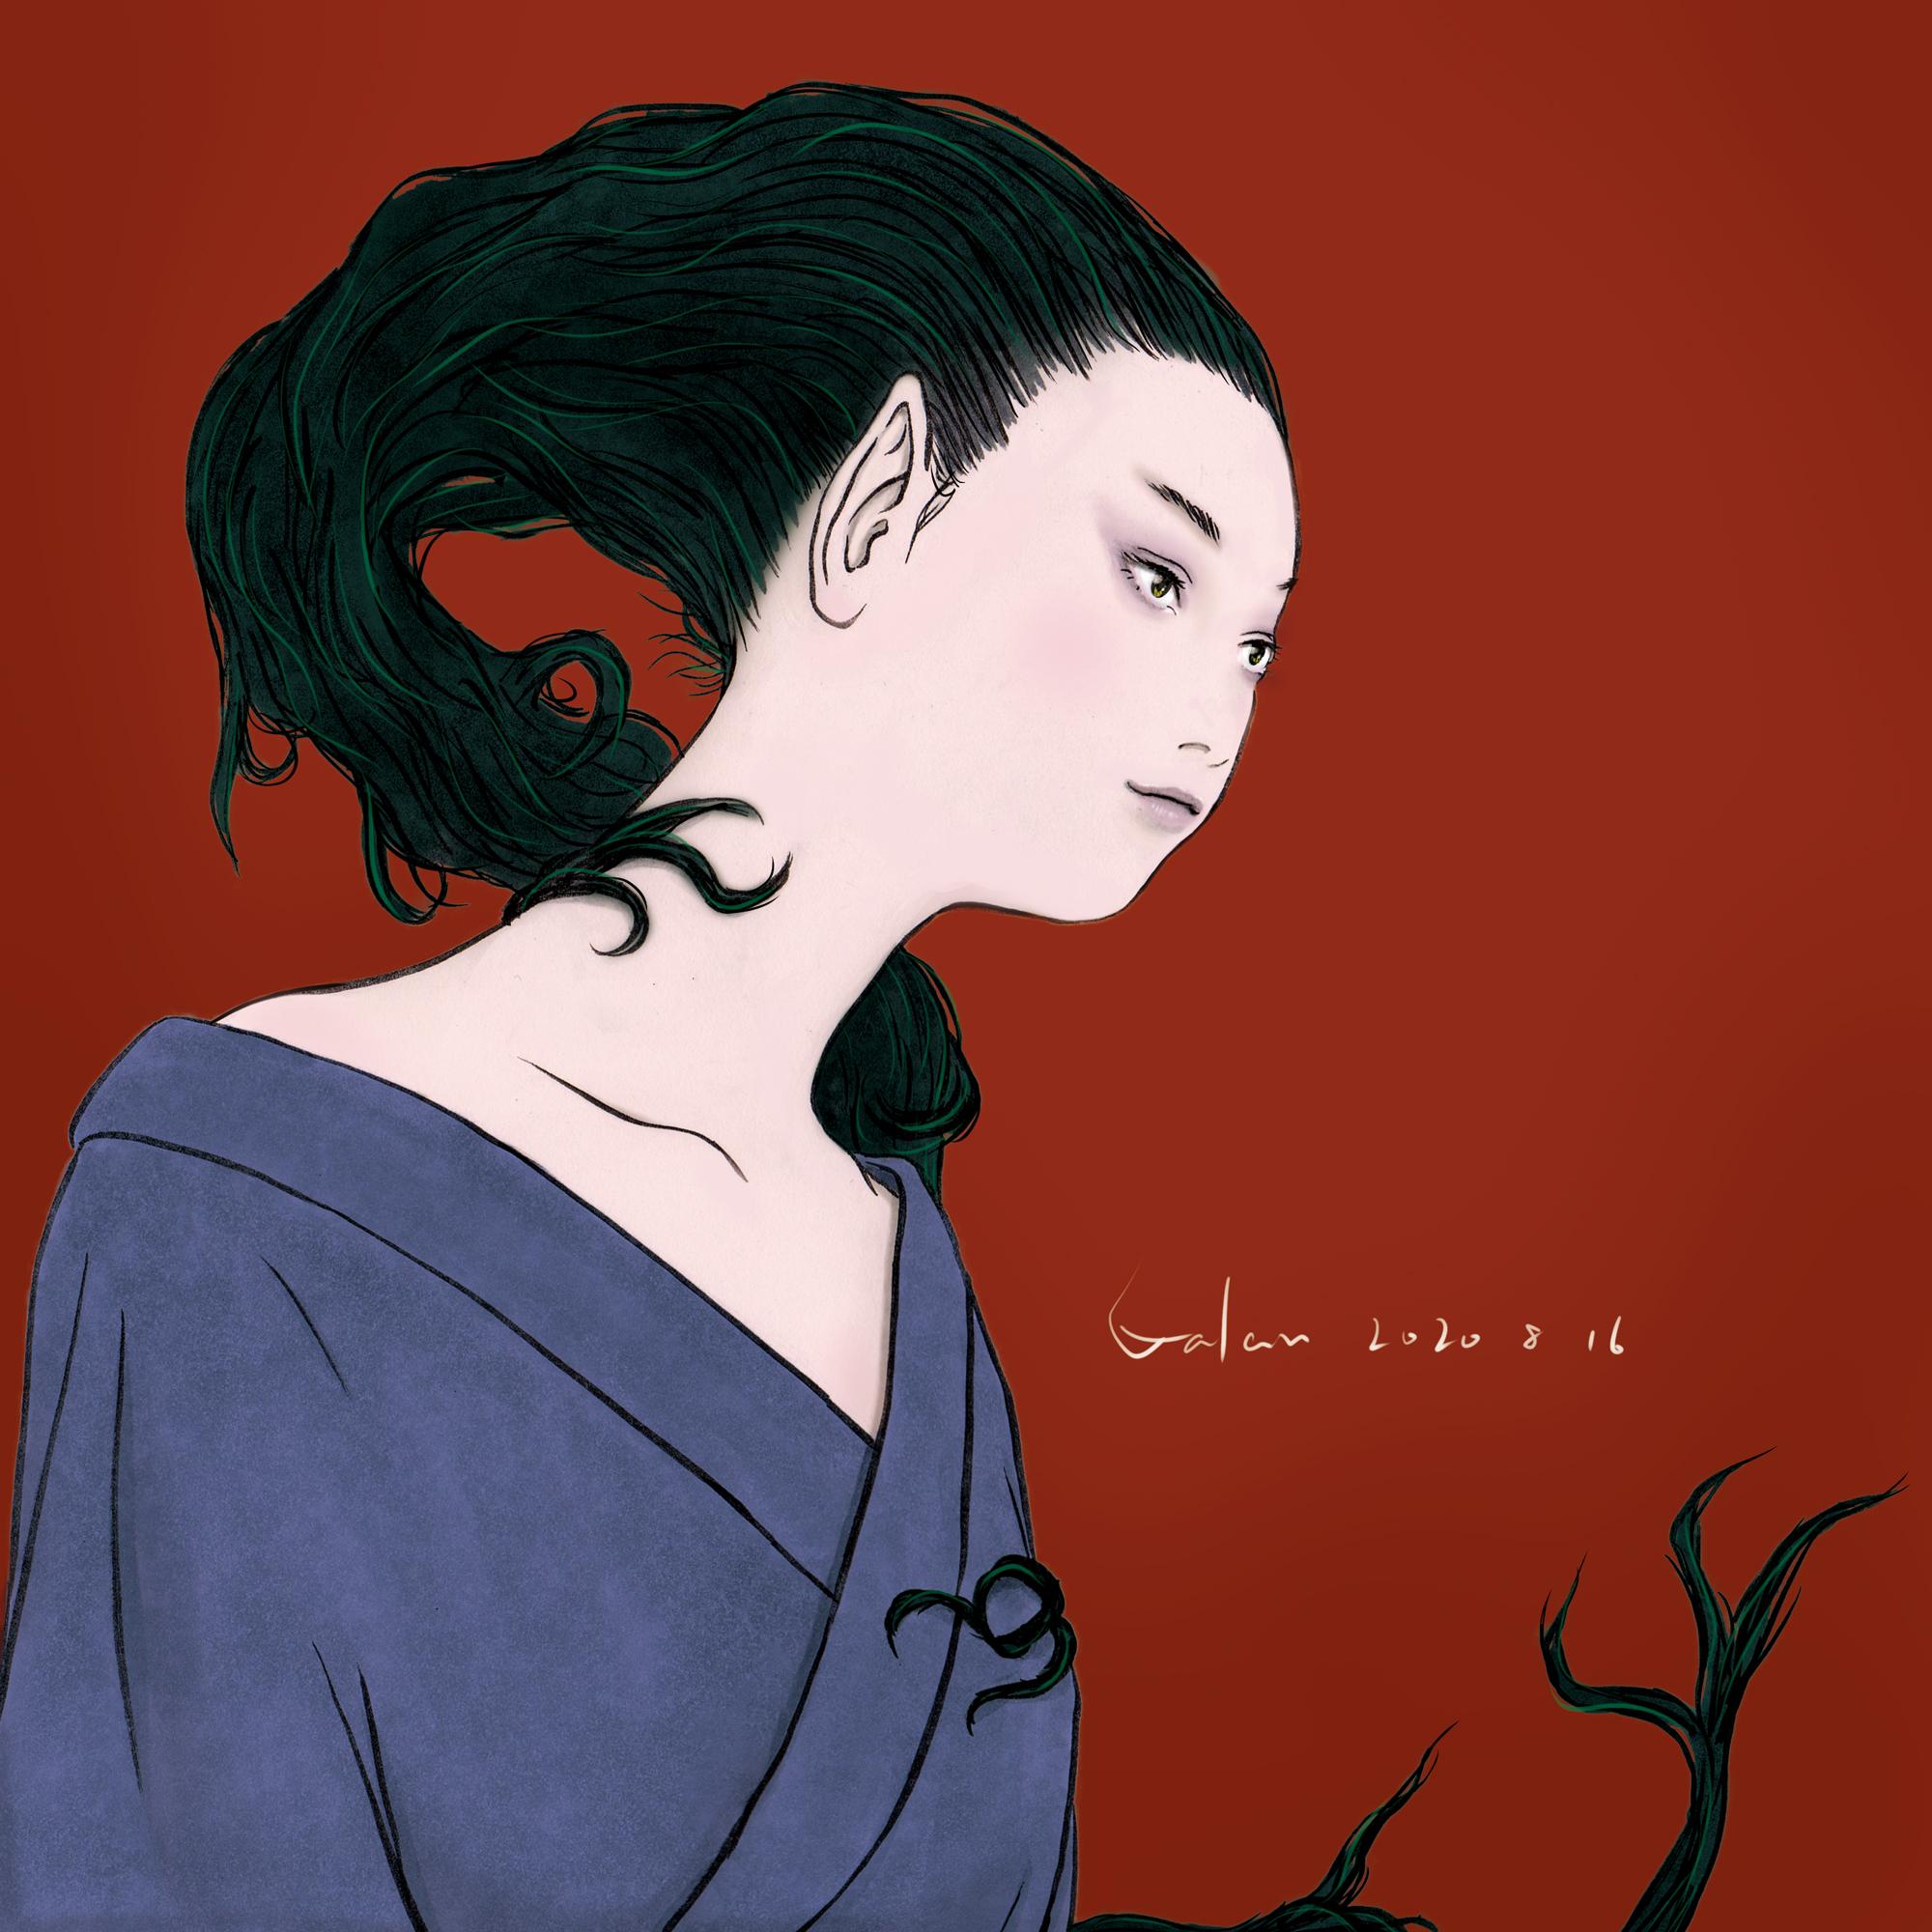 髪妖怪(color) KAMI-YOKAI